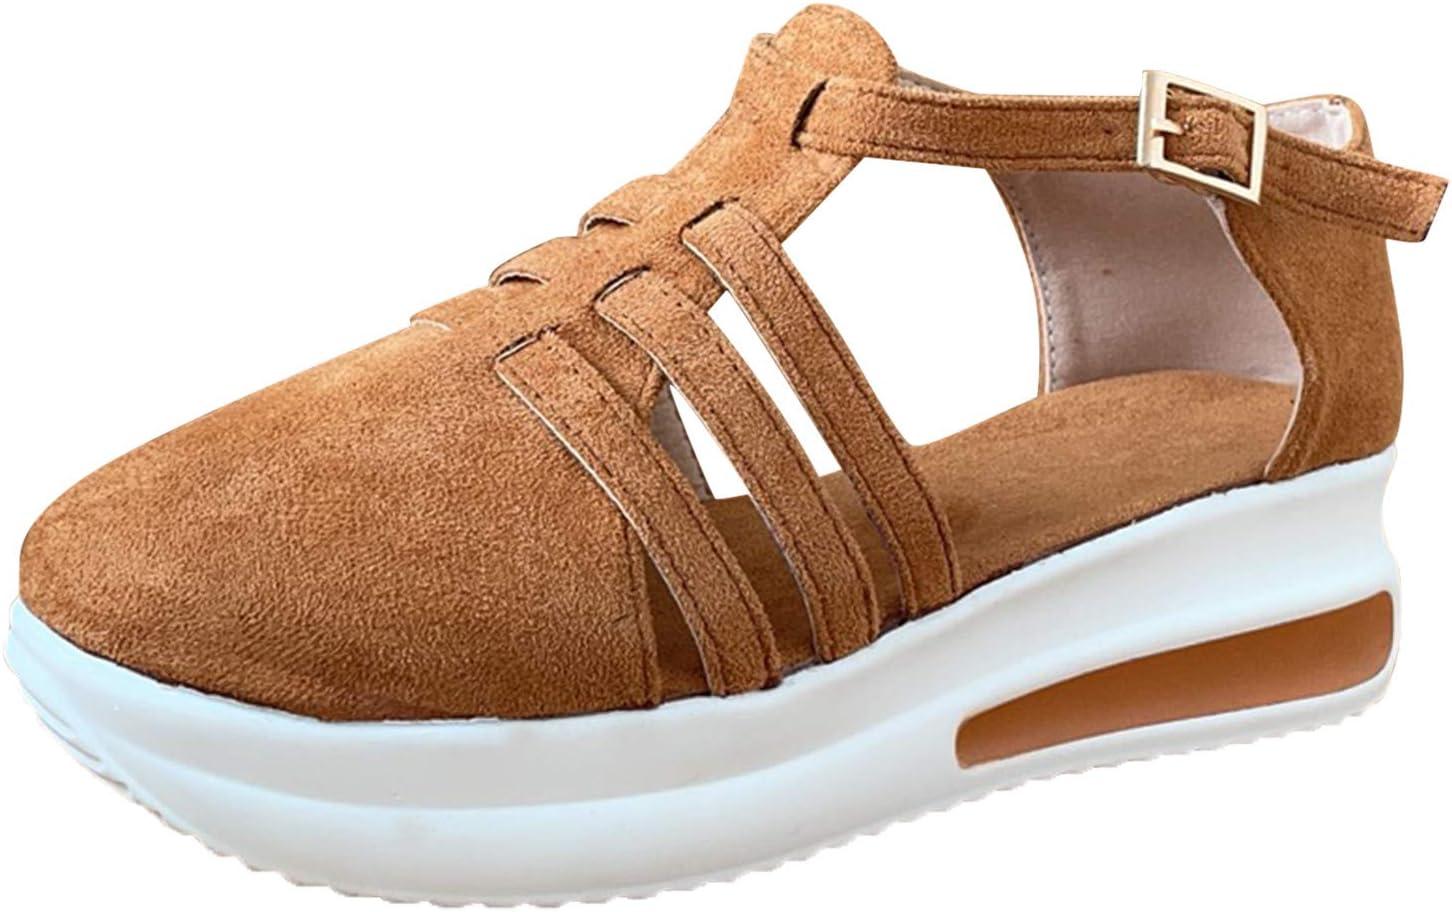 Fullwei Women's 5 ☆ very popular Cheap super special price Fashion Wedge Platform Ladi Strap Buckle Sandals